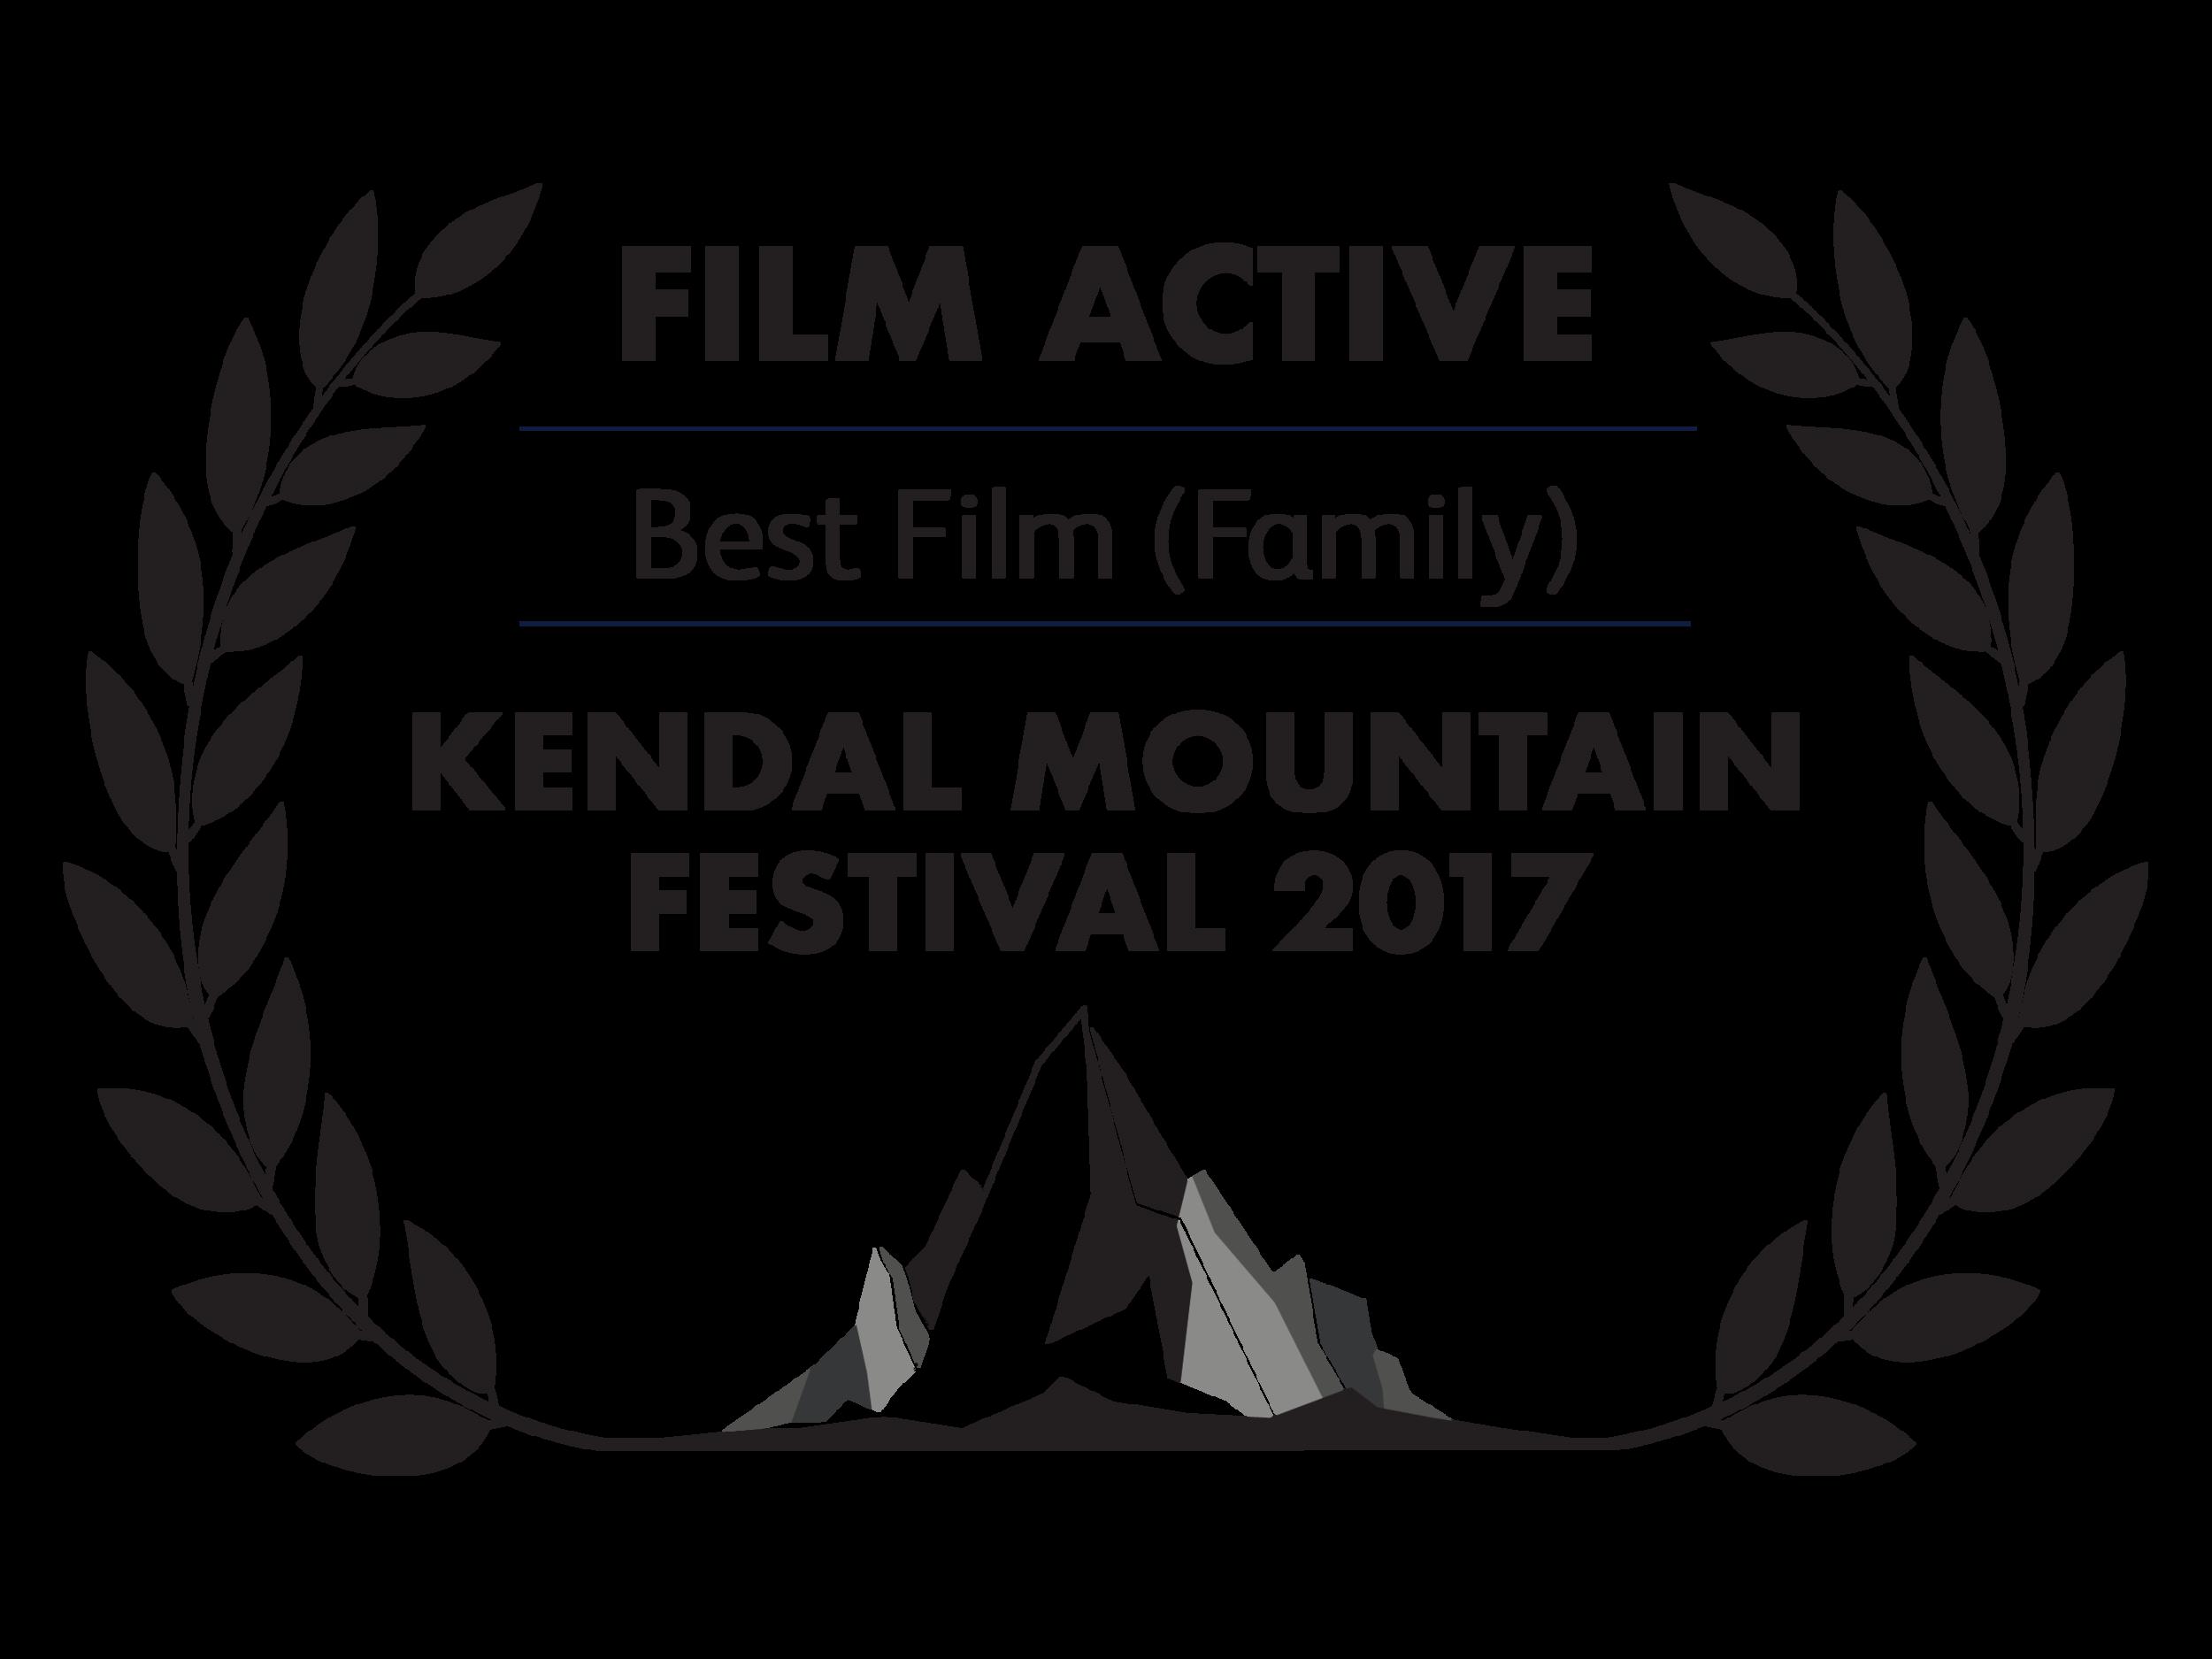 KMF LAURELS MASTER NEW 2017 FILM ACTIVE-04.png